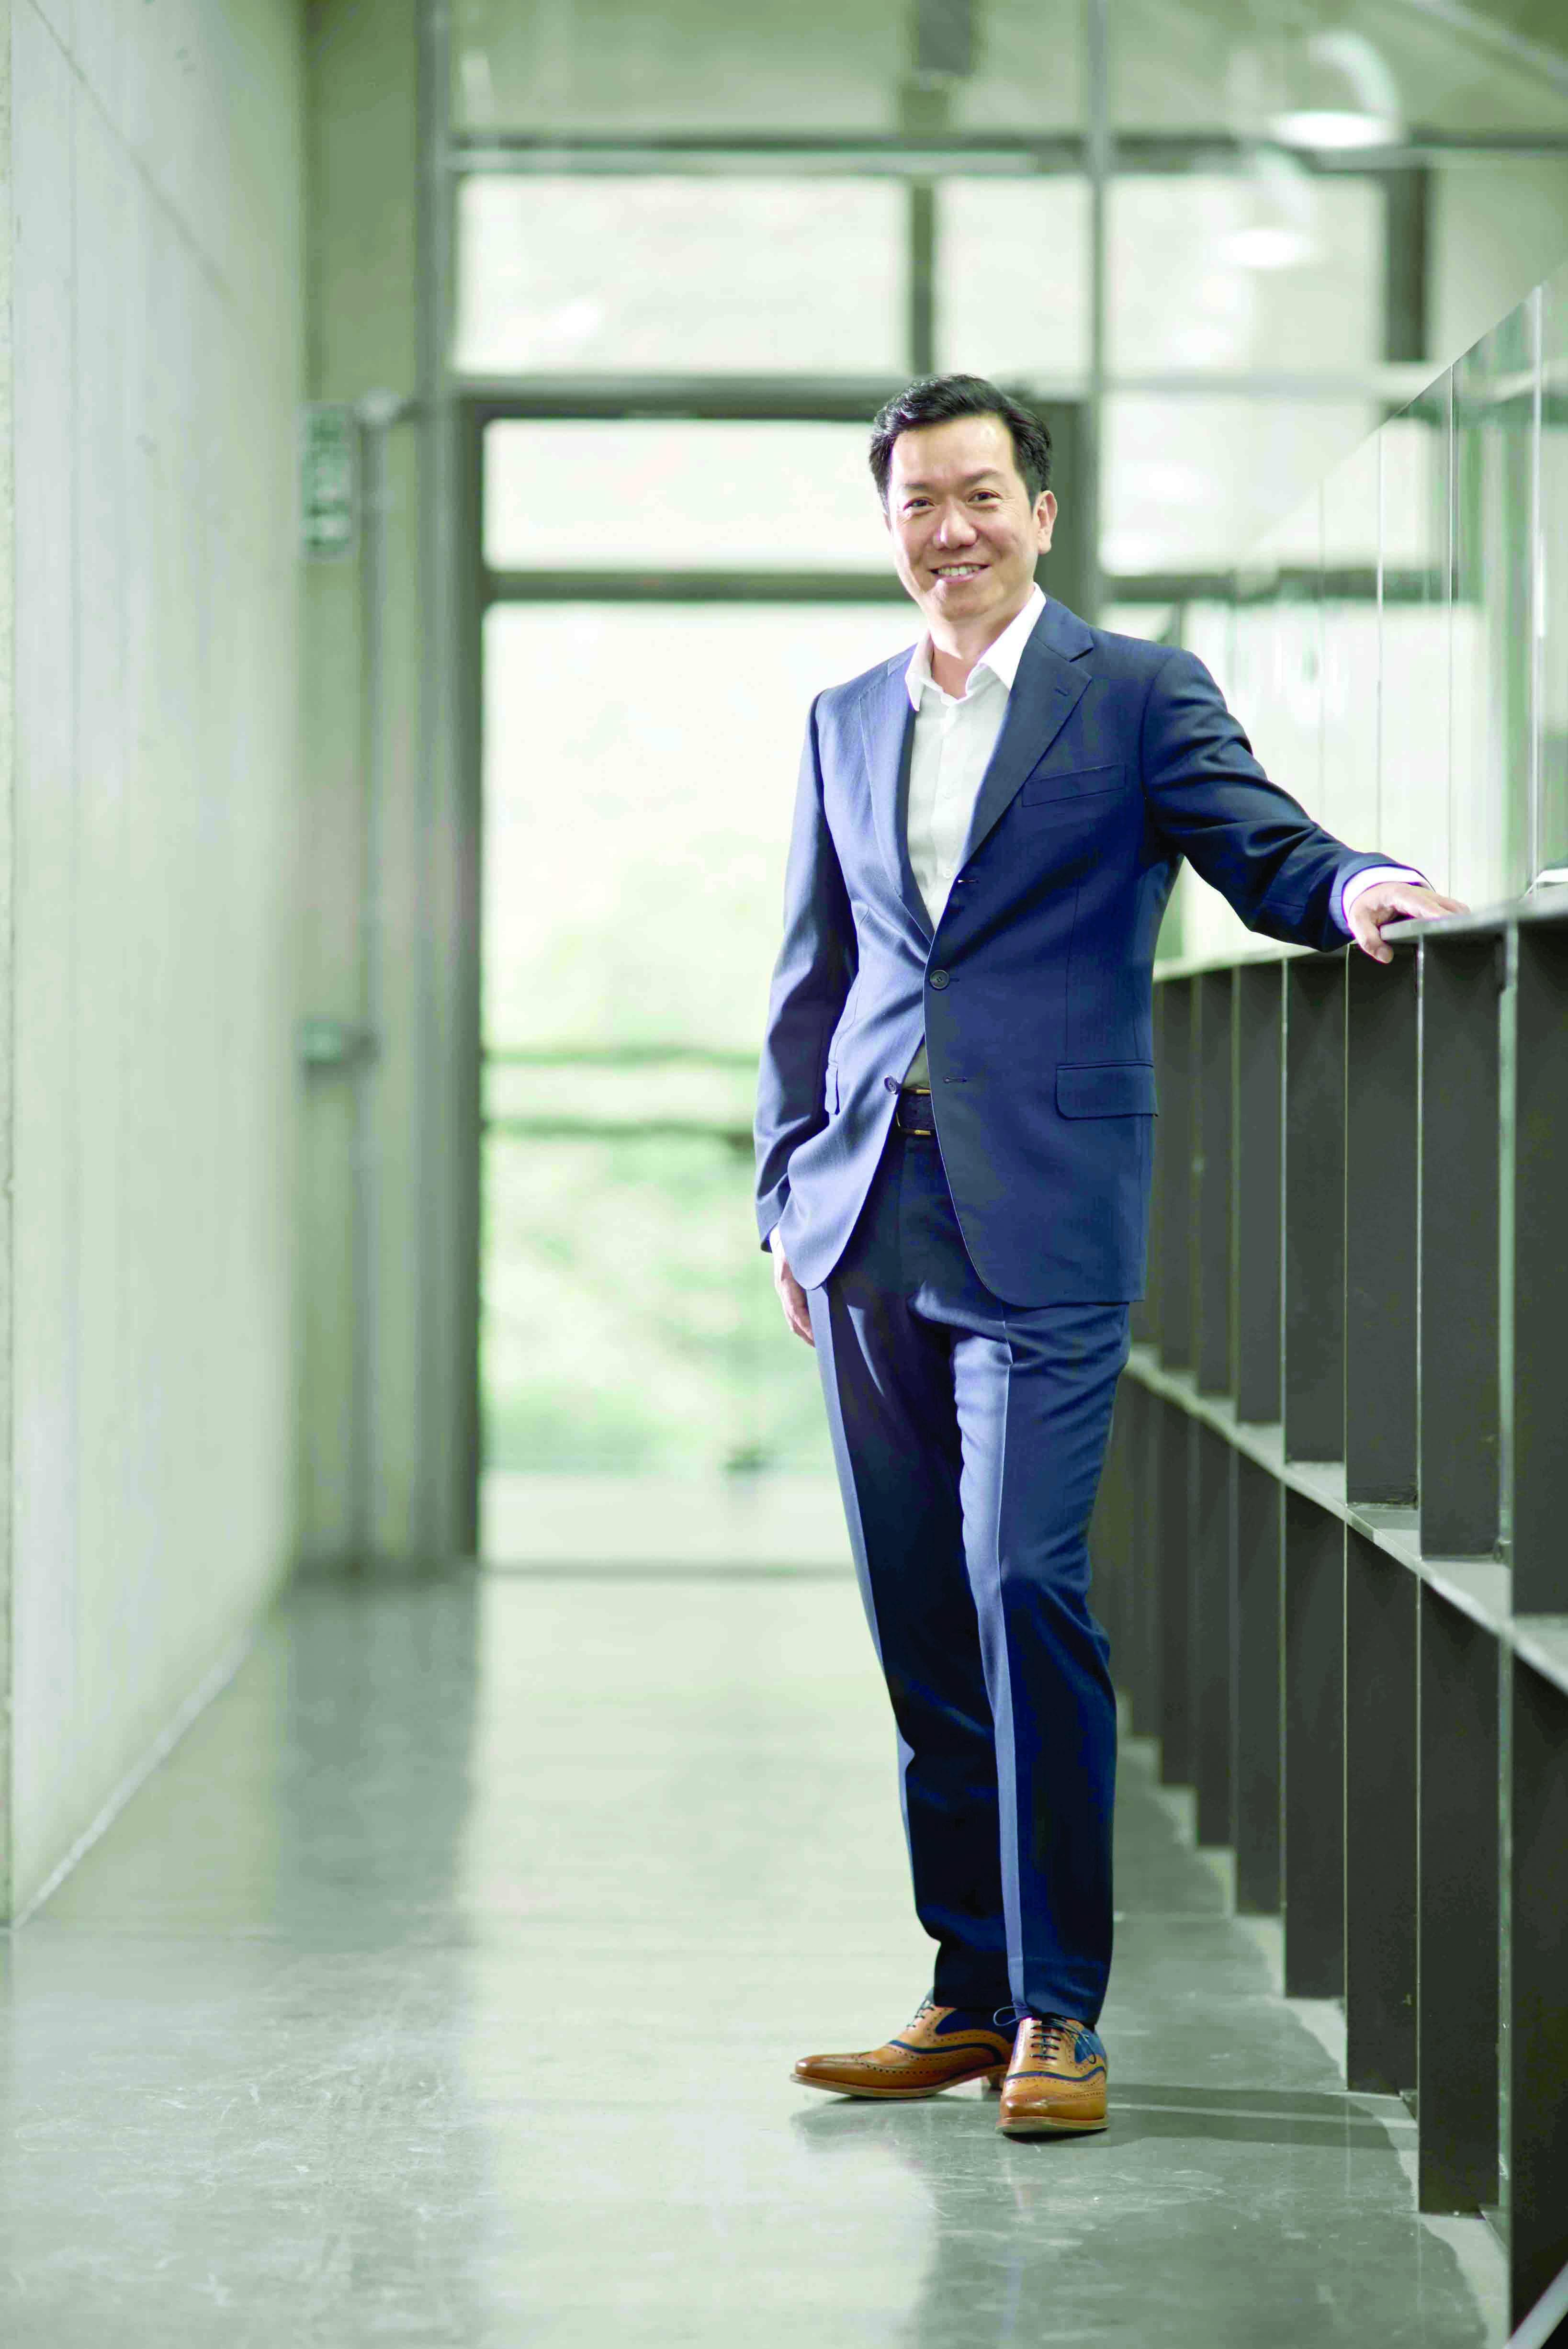 تعيين مصمم السيارات العالمي سانغ يوب لي نائباً لرئيس هيونداي موتور